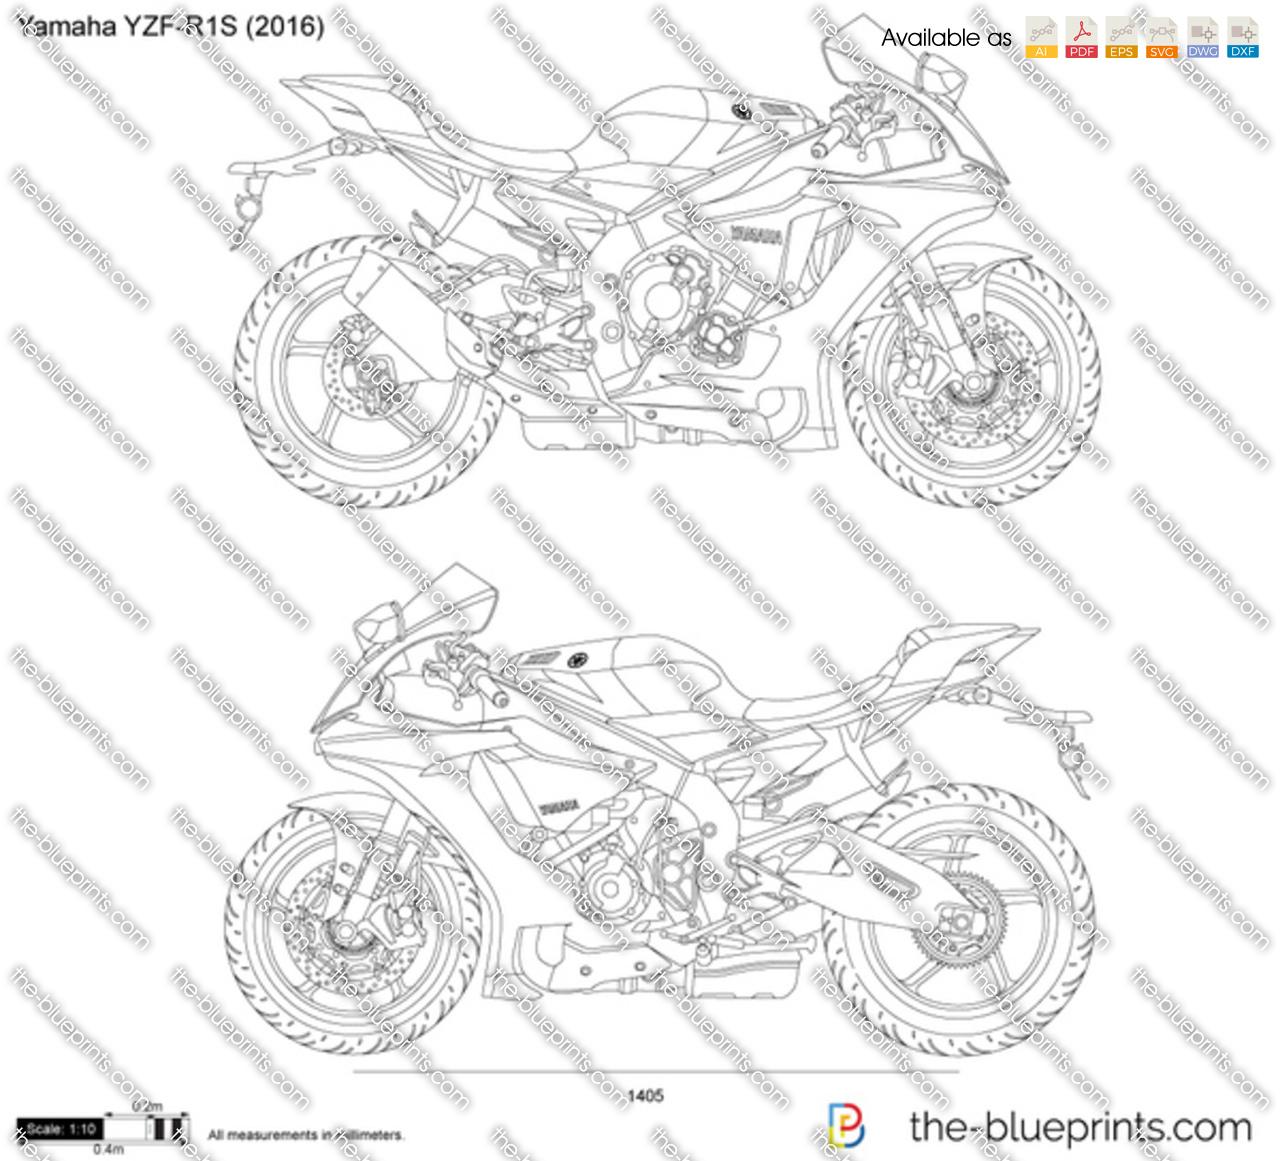 Yamaha YZF-R1S vector drawing